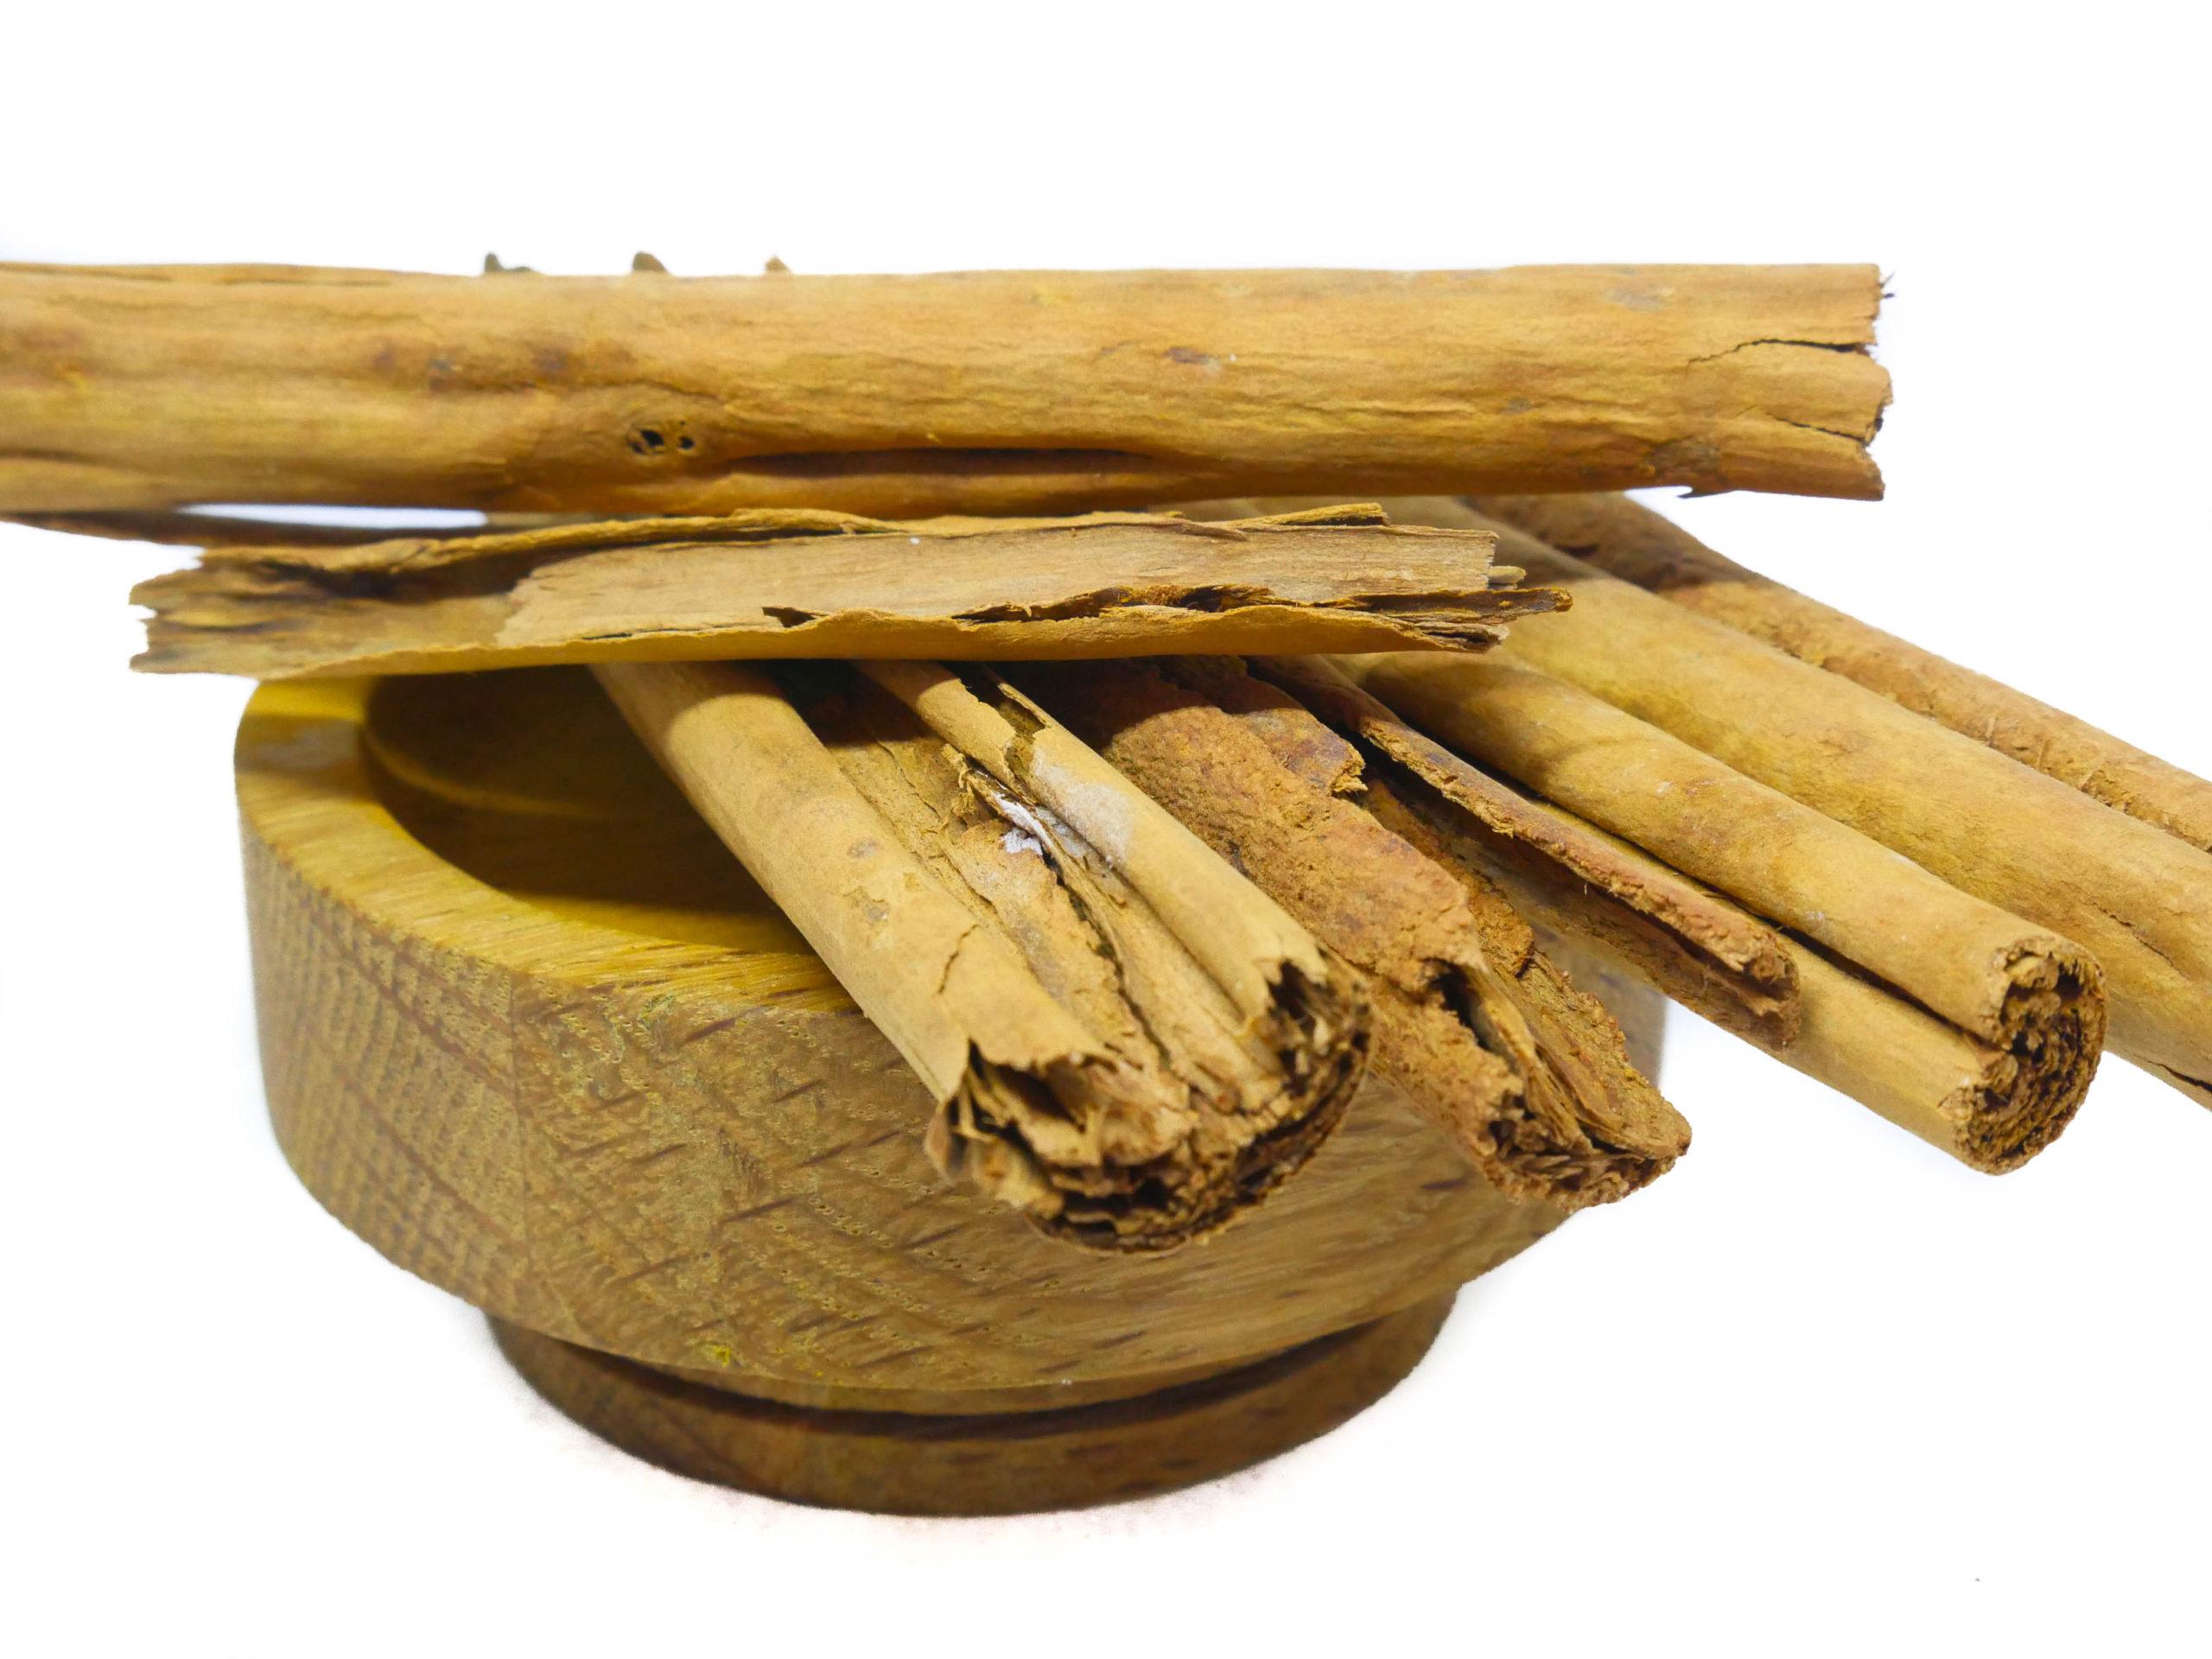 Whole Ceylon Cinnamon sticks from the Natural Spot